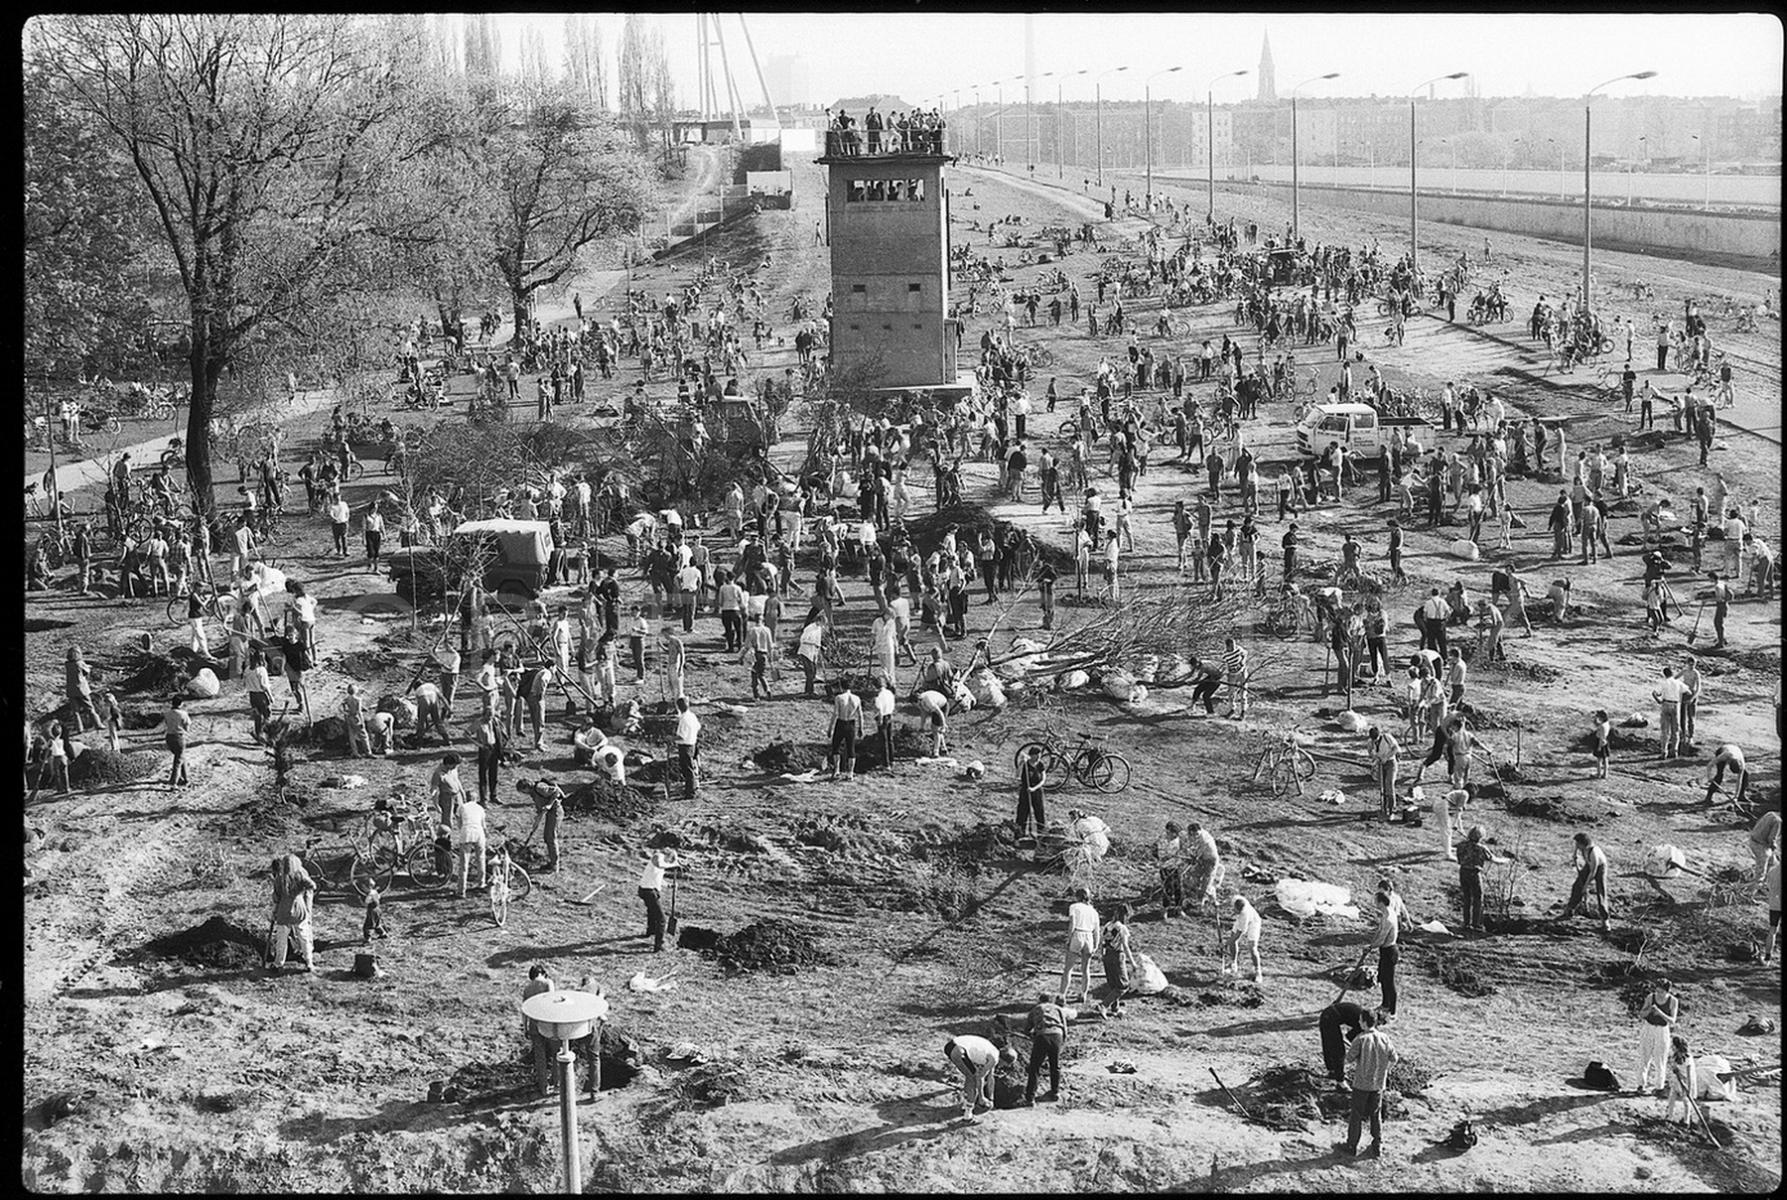 Nr02-044_Mauerpark-Baumpflanzung_1.4.1990